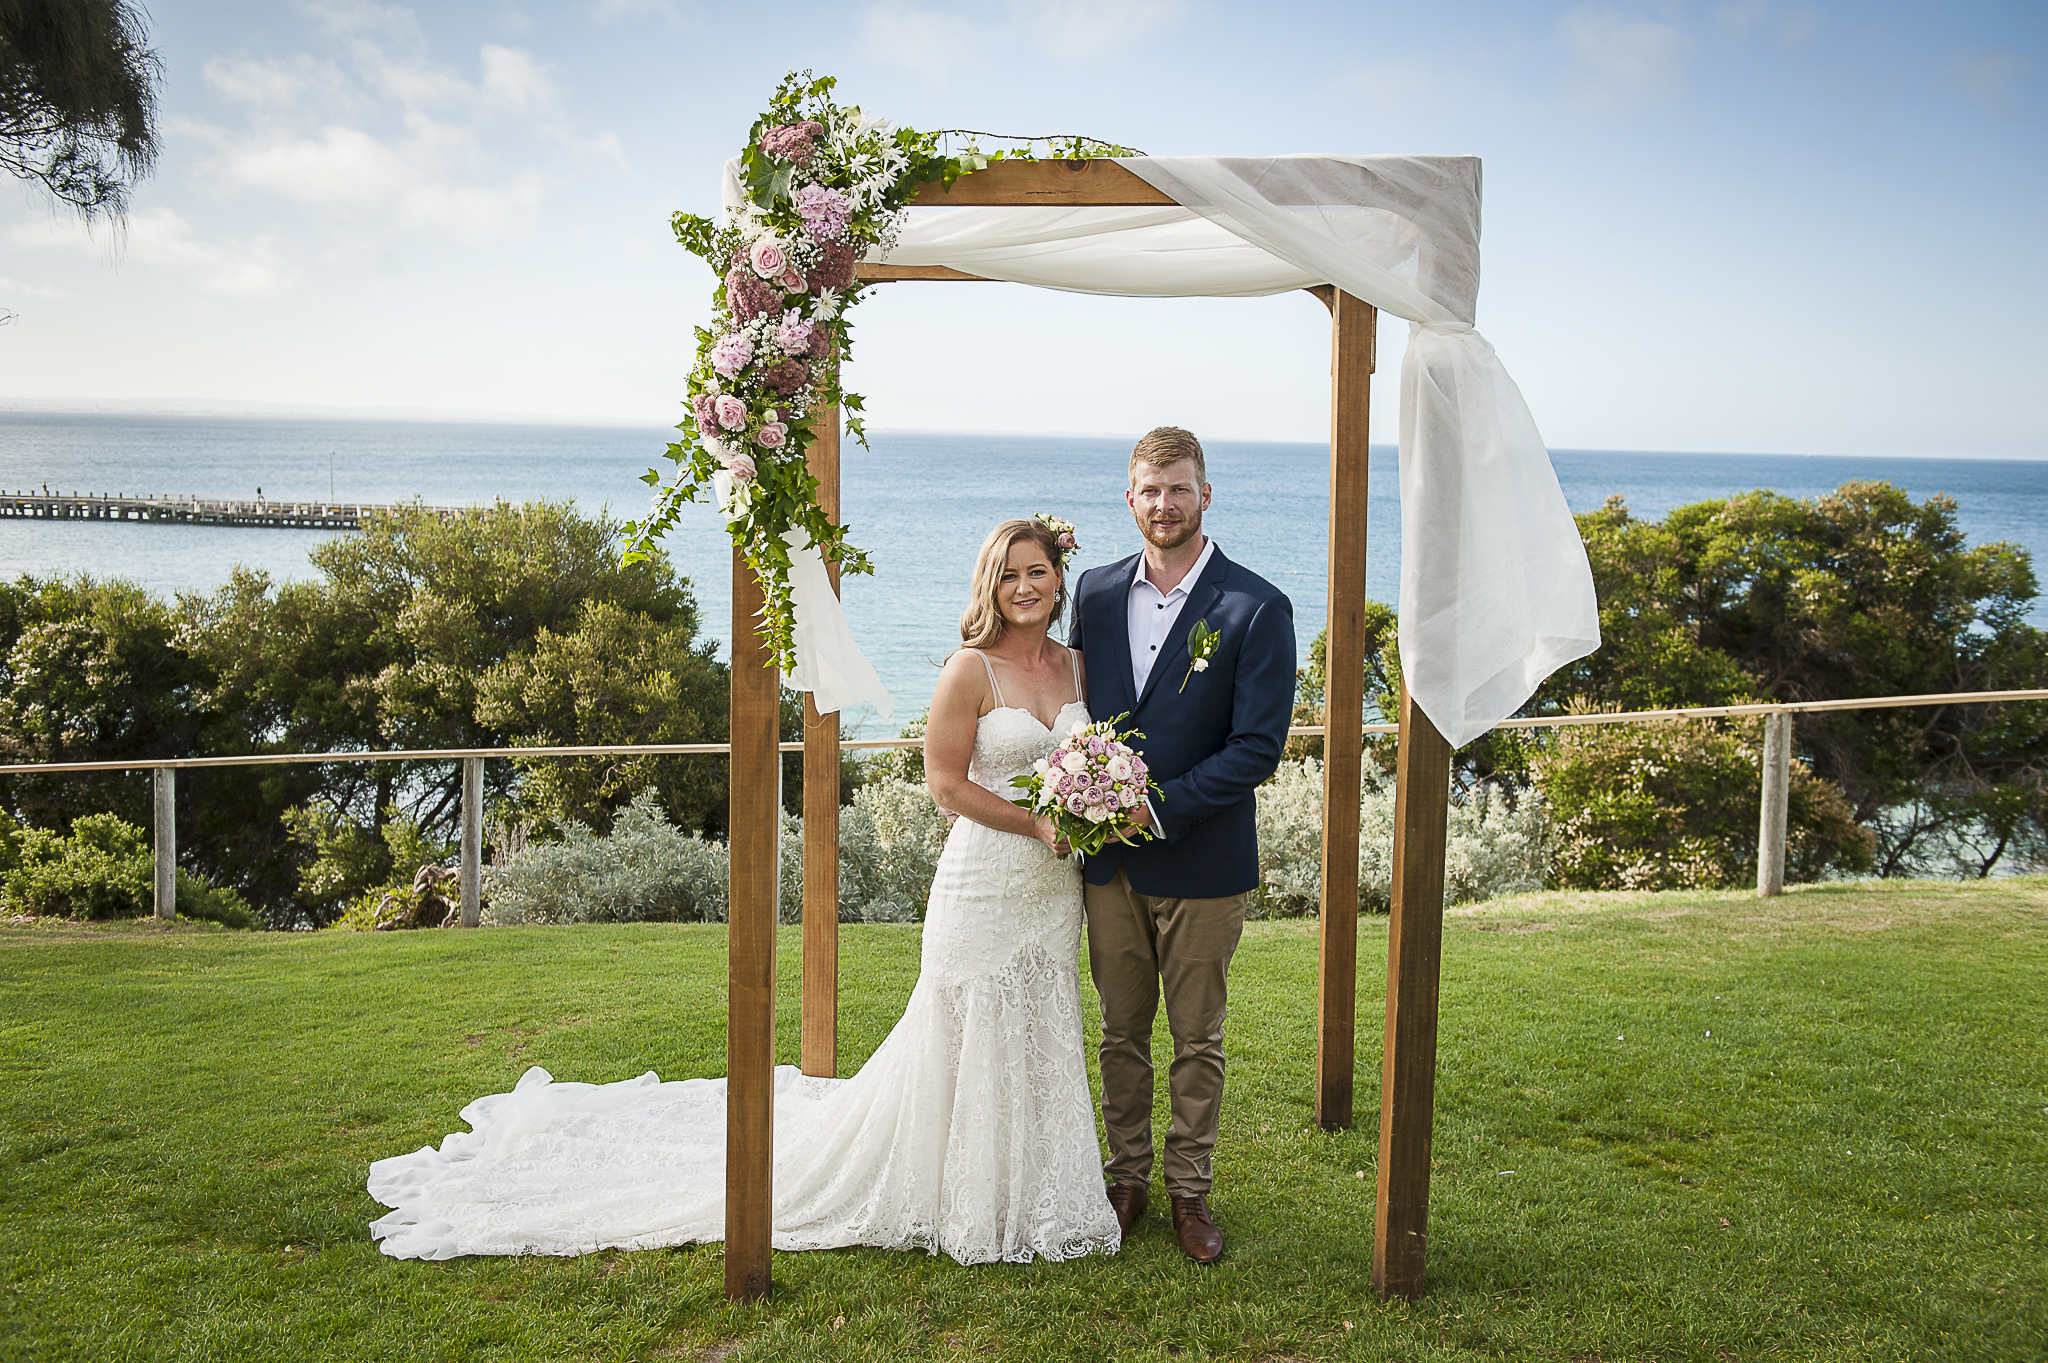 wedding flowers, vintage bride, Daylesford wedding, country wedding, vintage wedding, Bringlebit farm, kiss the bride